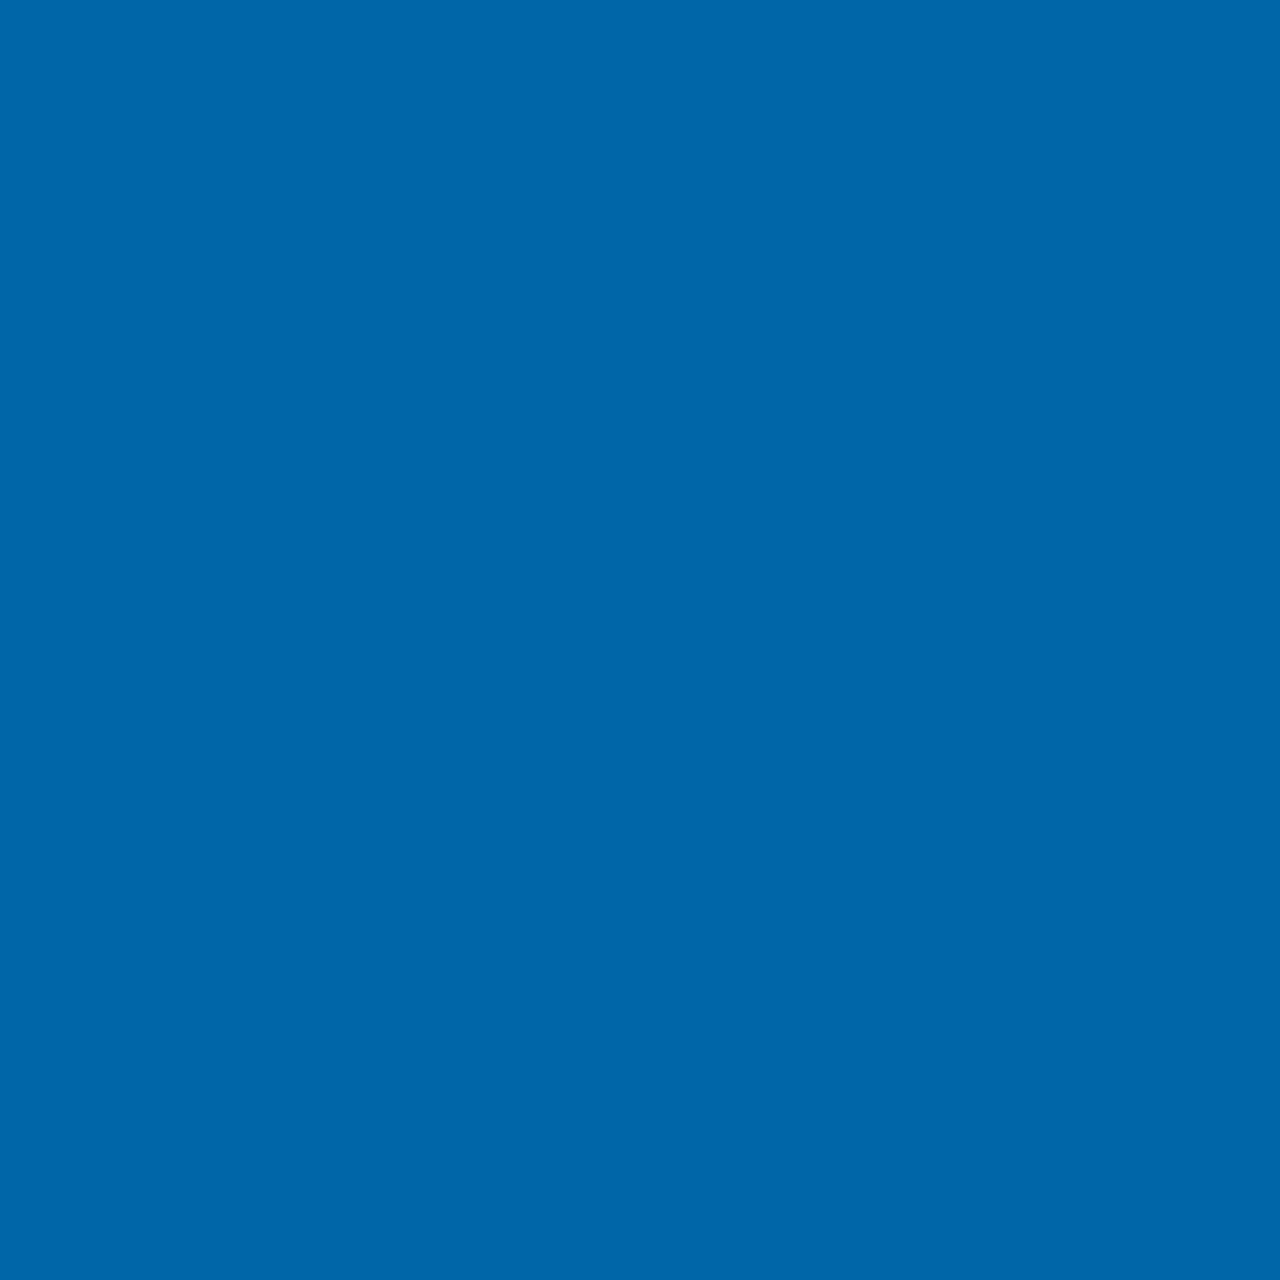 "#0084 Rosco Gels Roscolux Zephyr Blue, 20x24"""